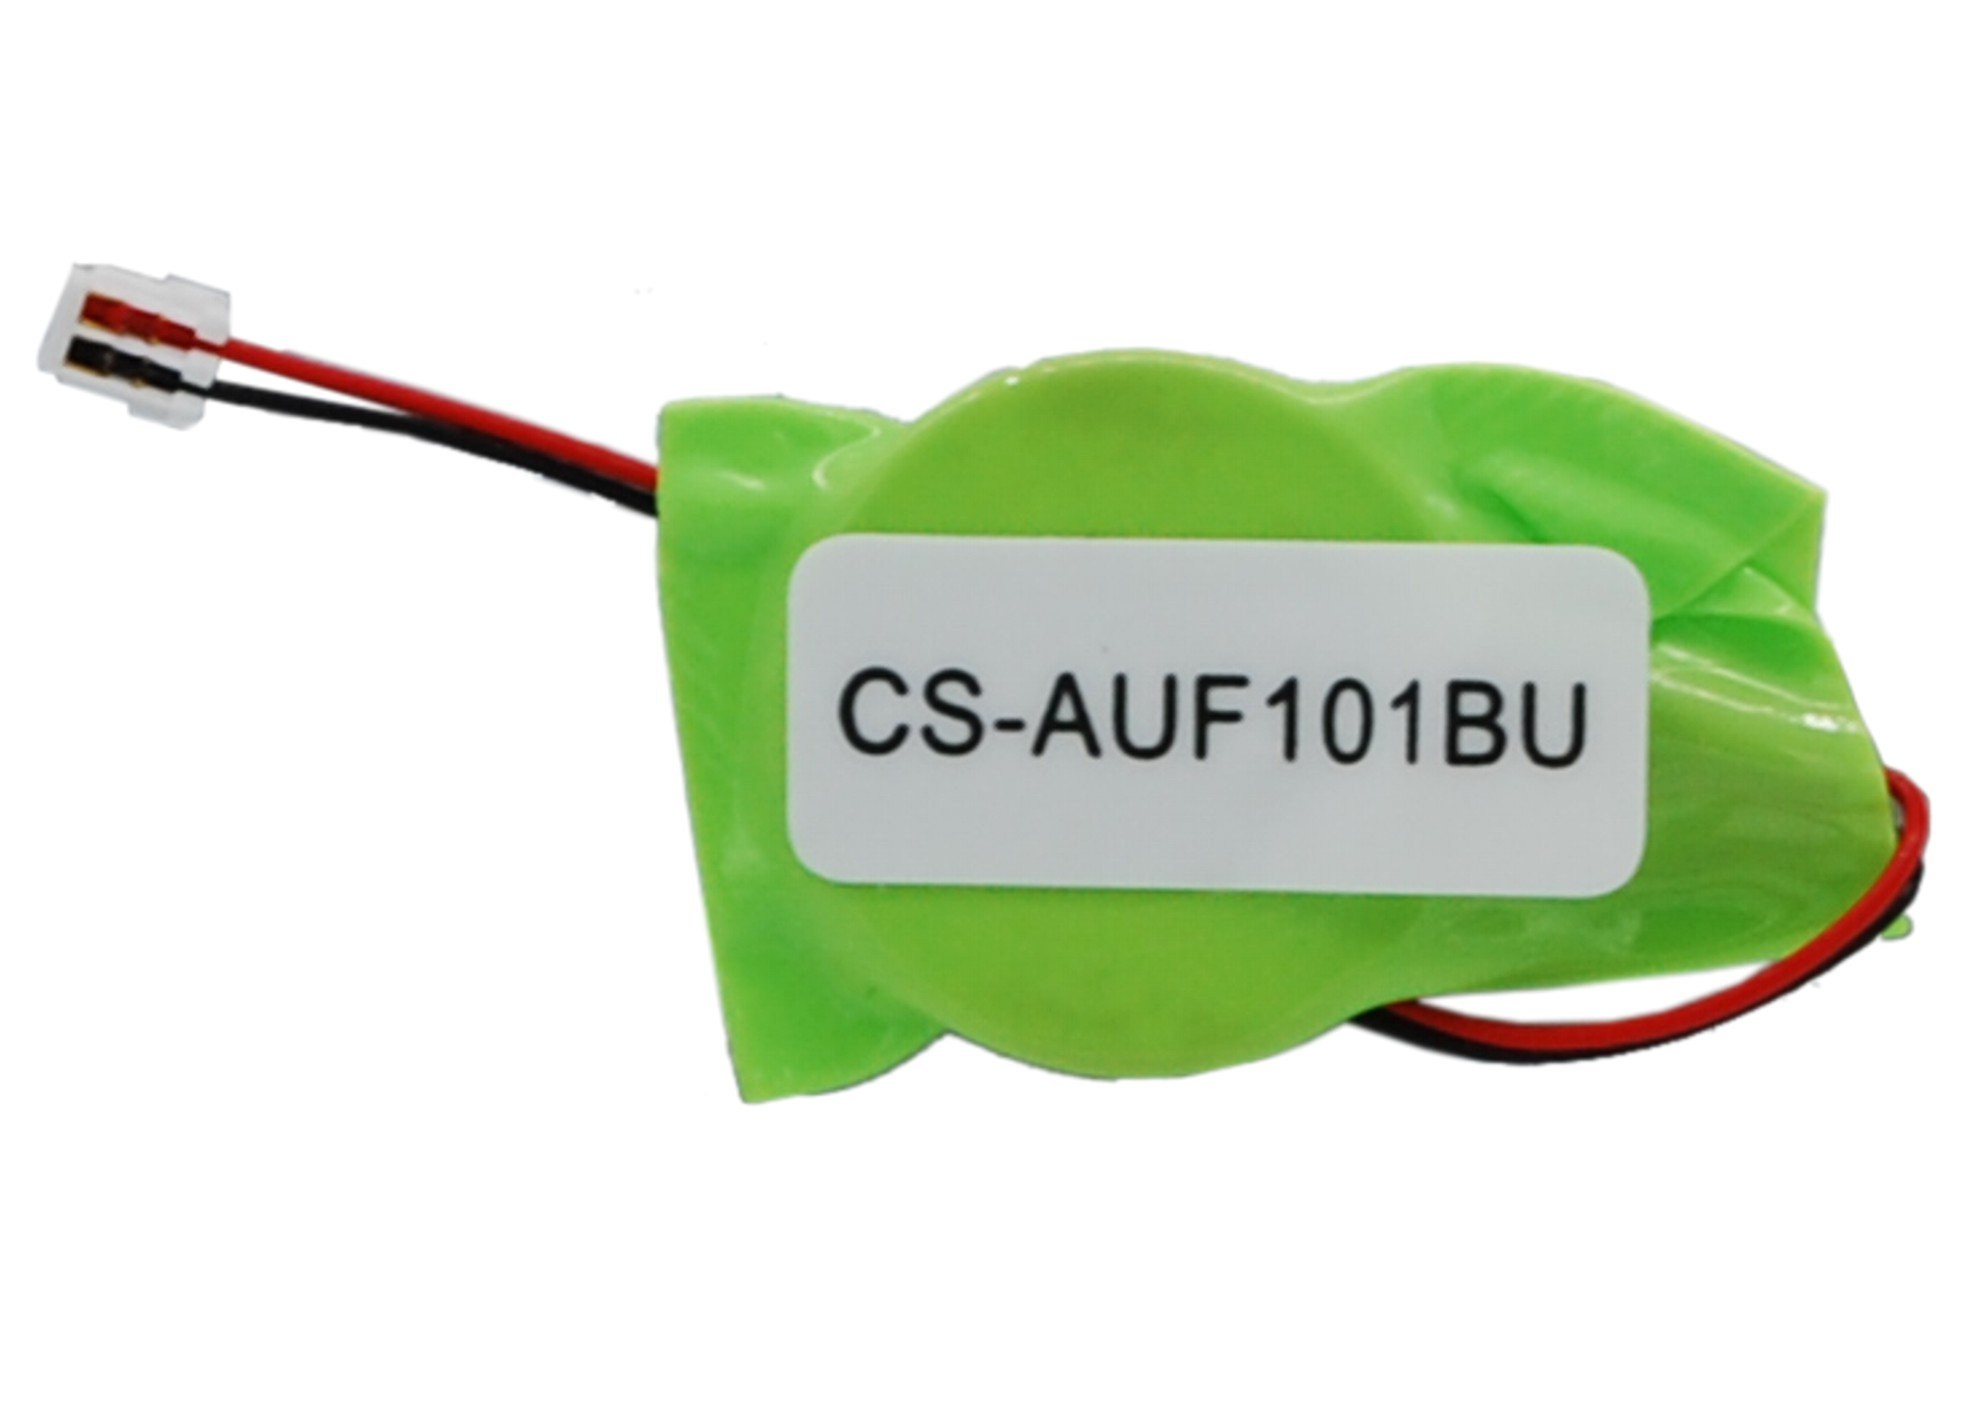 Cameron Sino baterie cmos pro ASUS Eee Pad Transformer TF101-1B001A 3V Li-ion 40mAh zelená - neoriginální